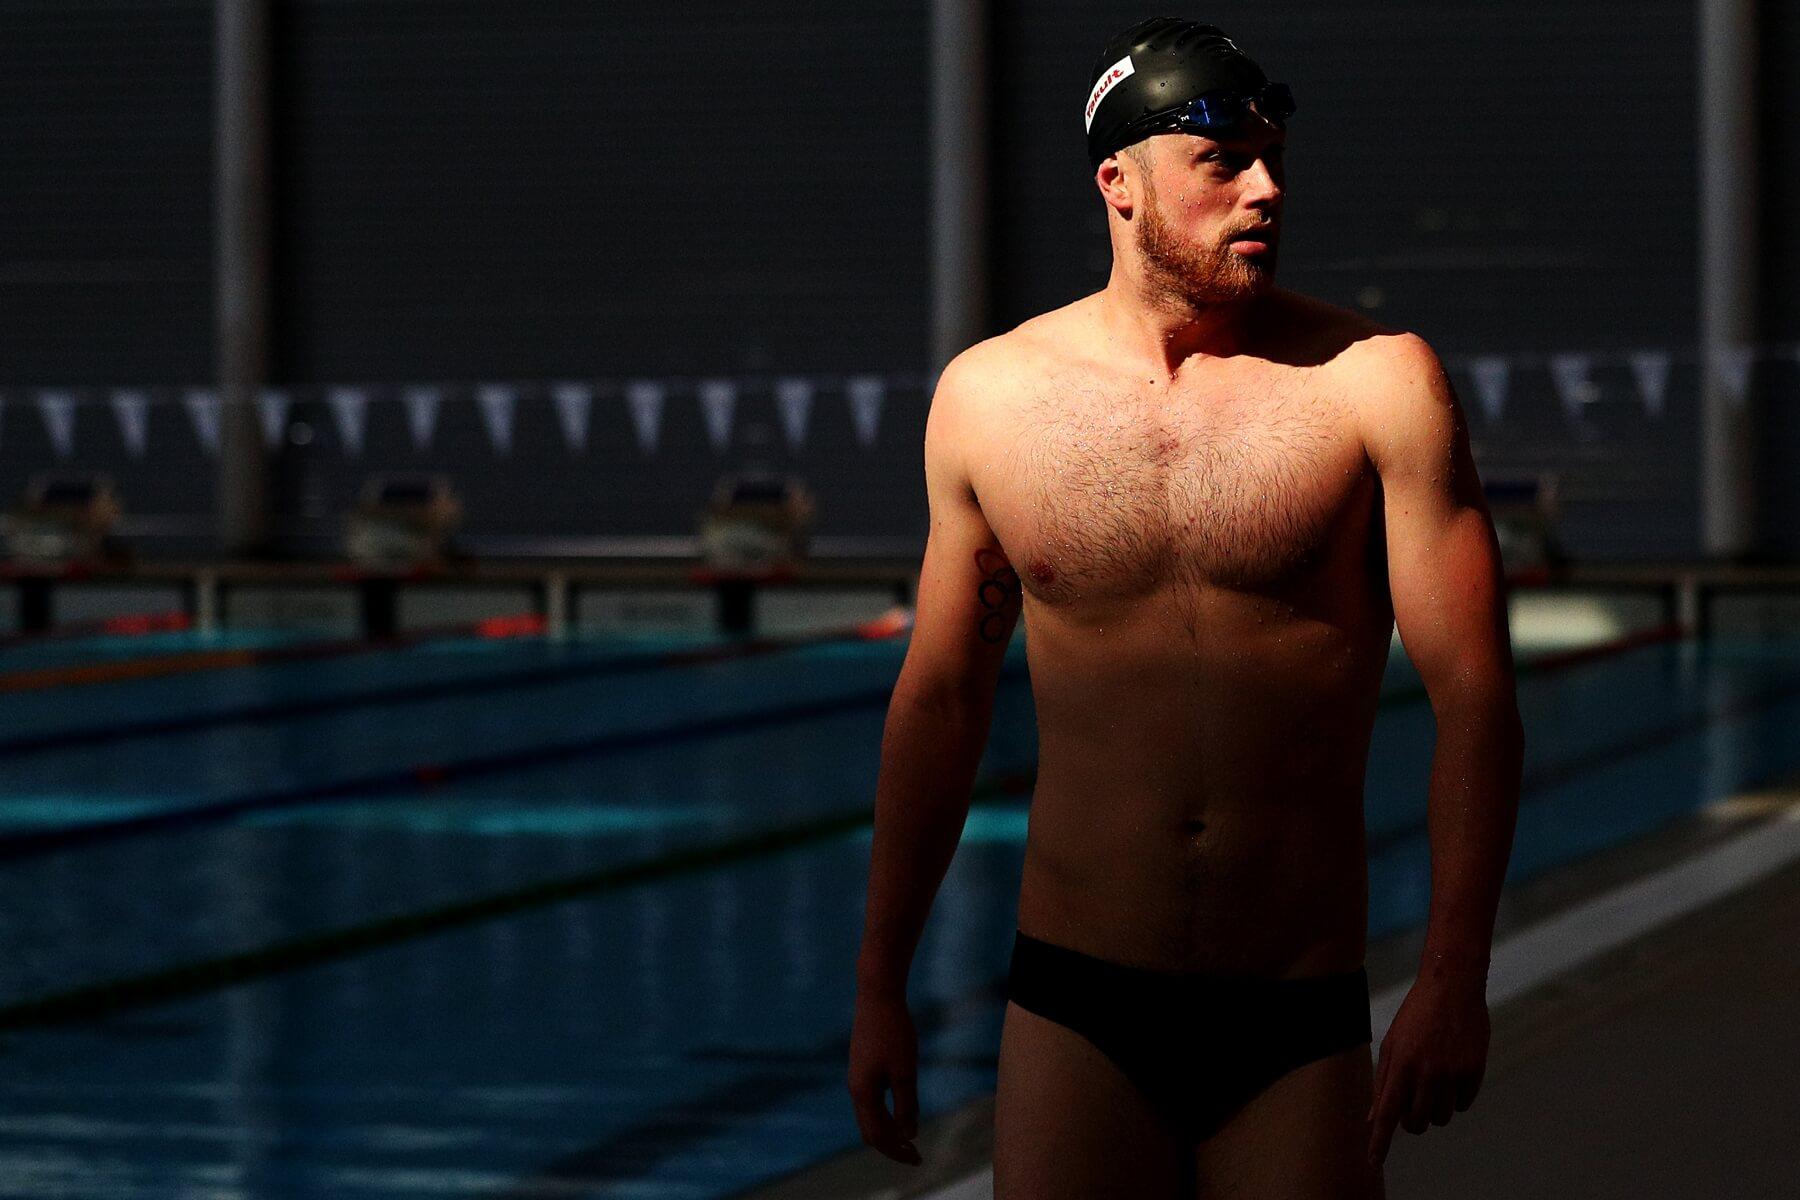 Olympic swimmer Jack Conger